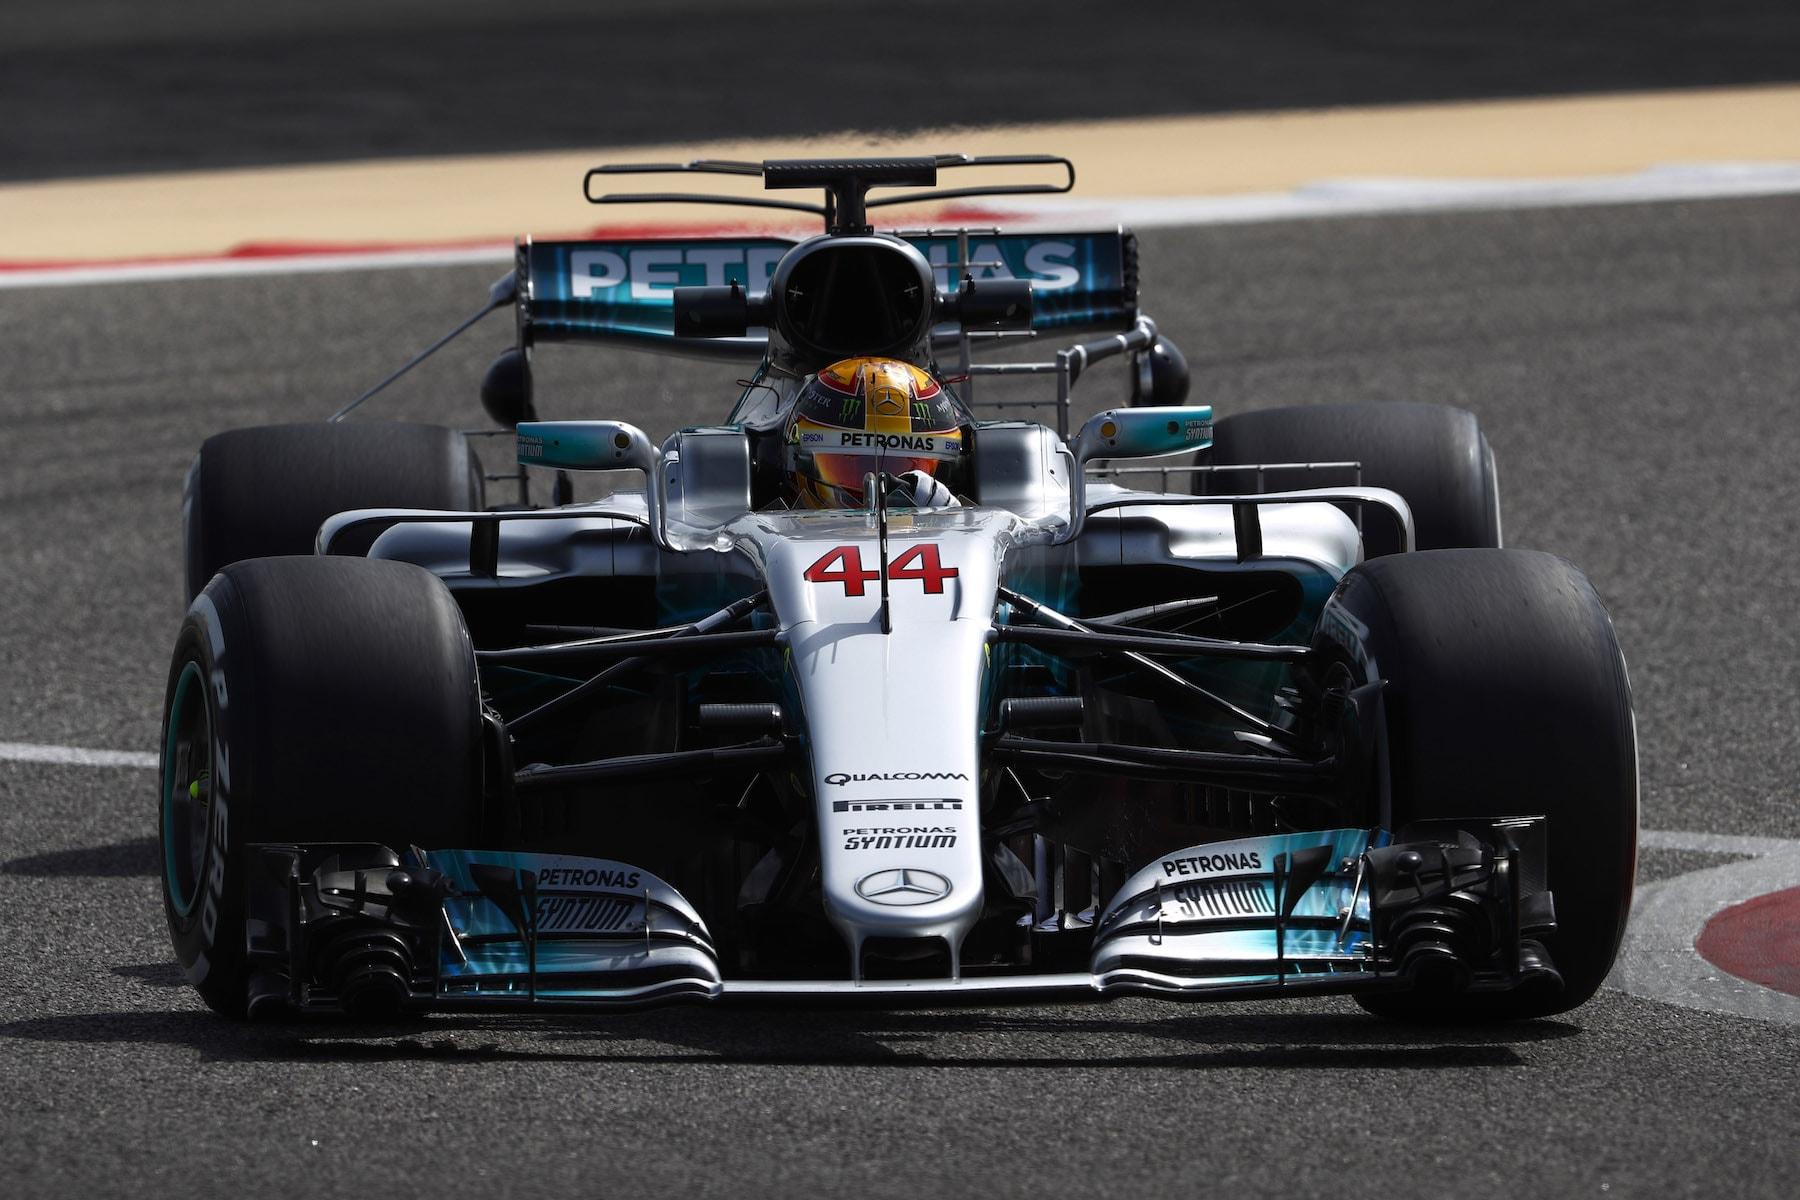 2017 Lewis Hamilton | Mercedes W08 | 2017 Bahrain test 3 copy.jpg